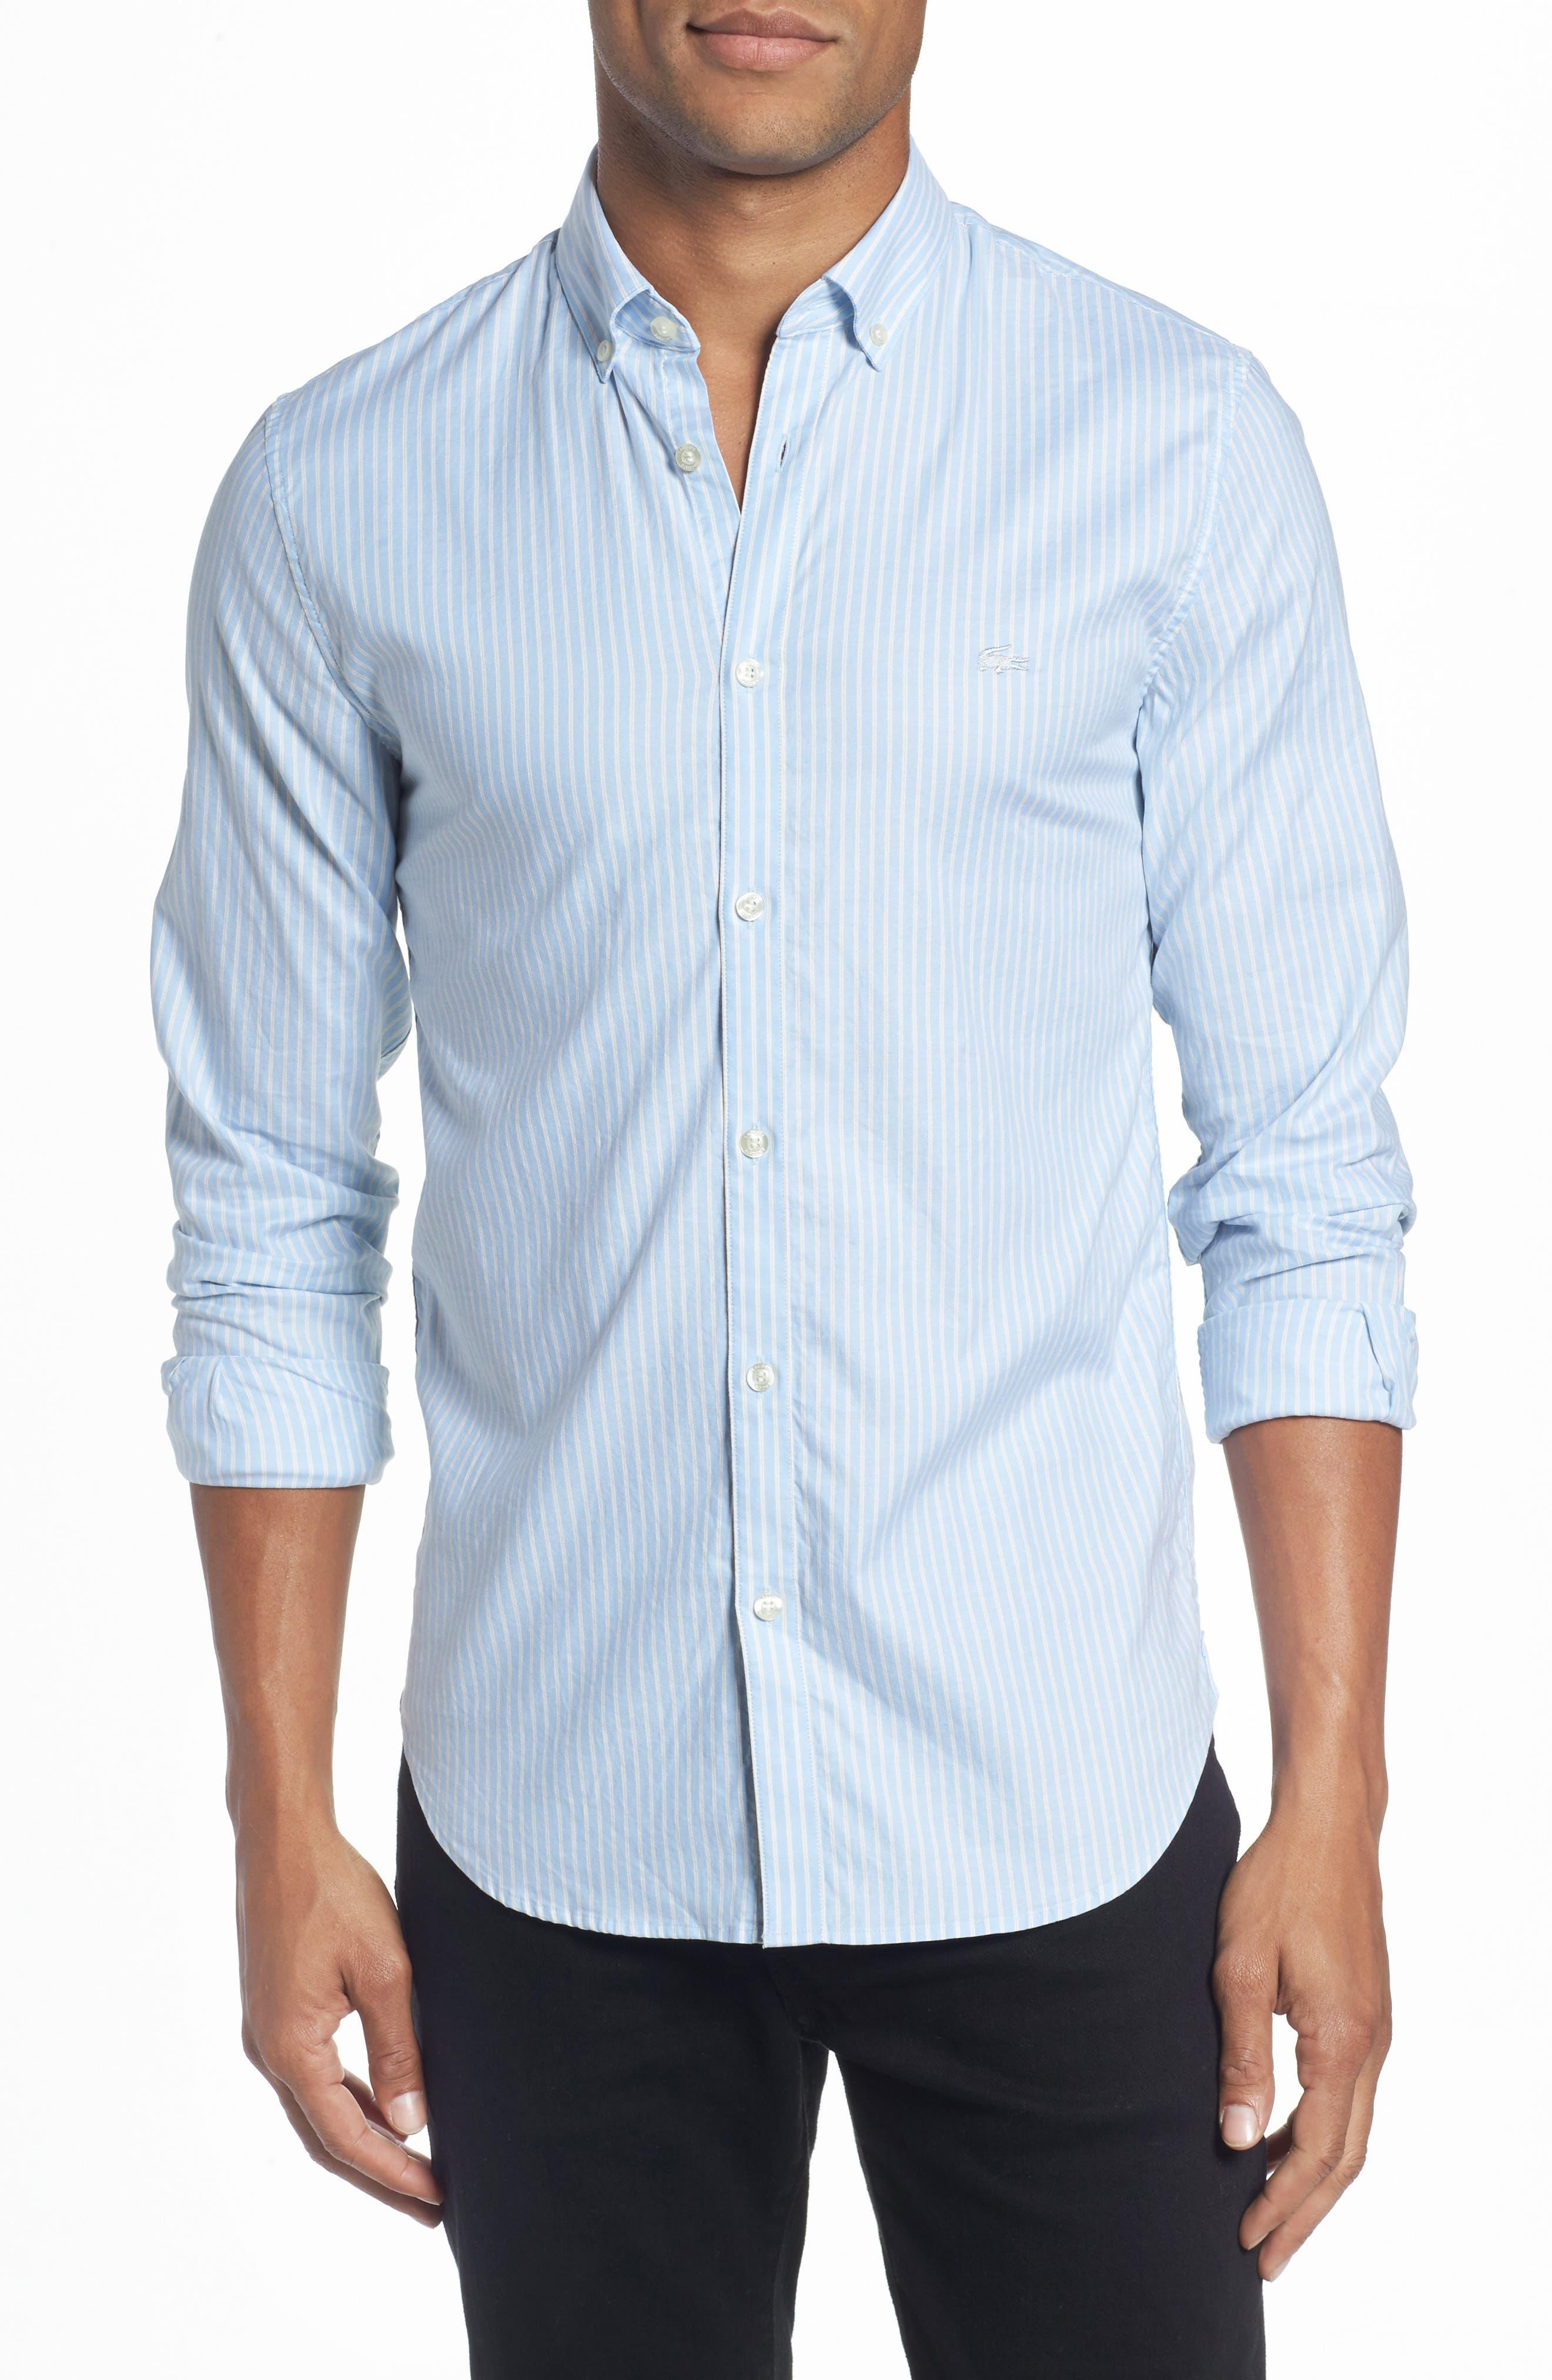 Lacoste Slim Fit Stripe Shirt